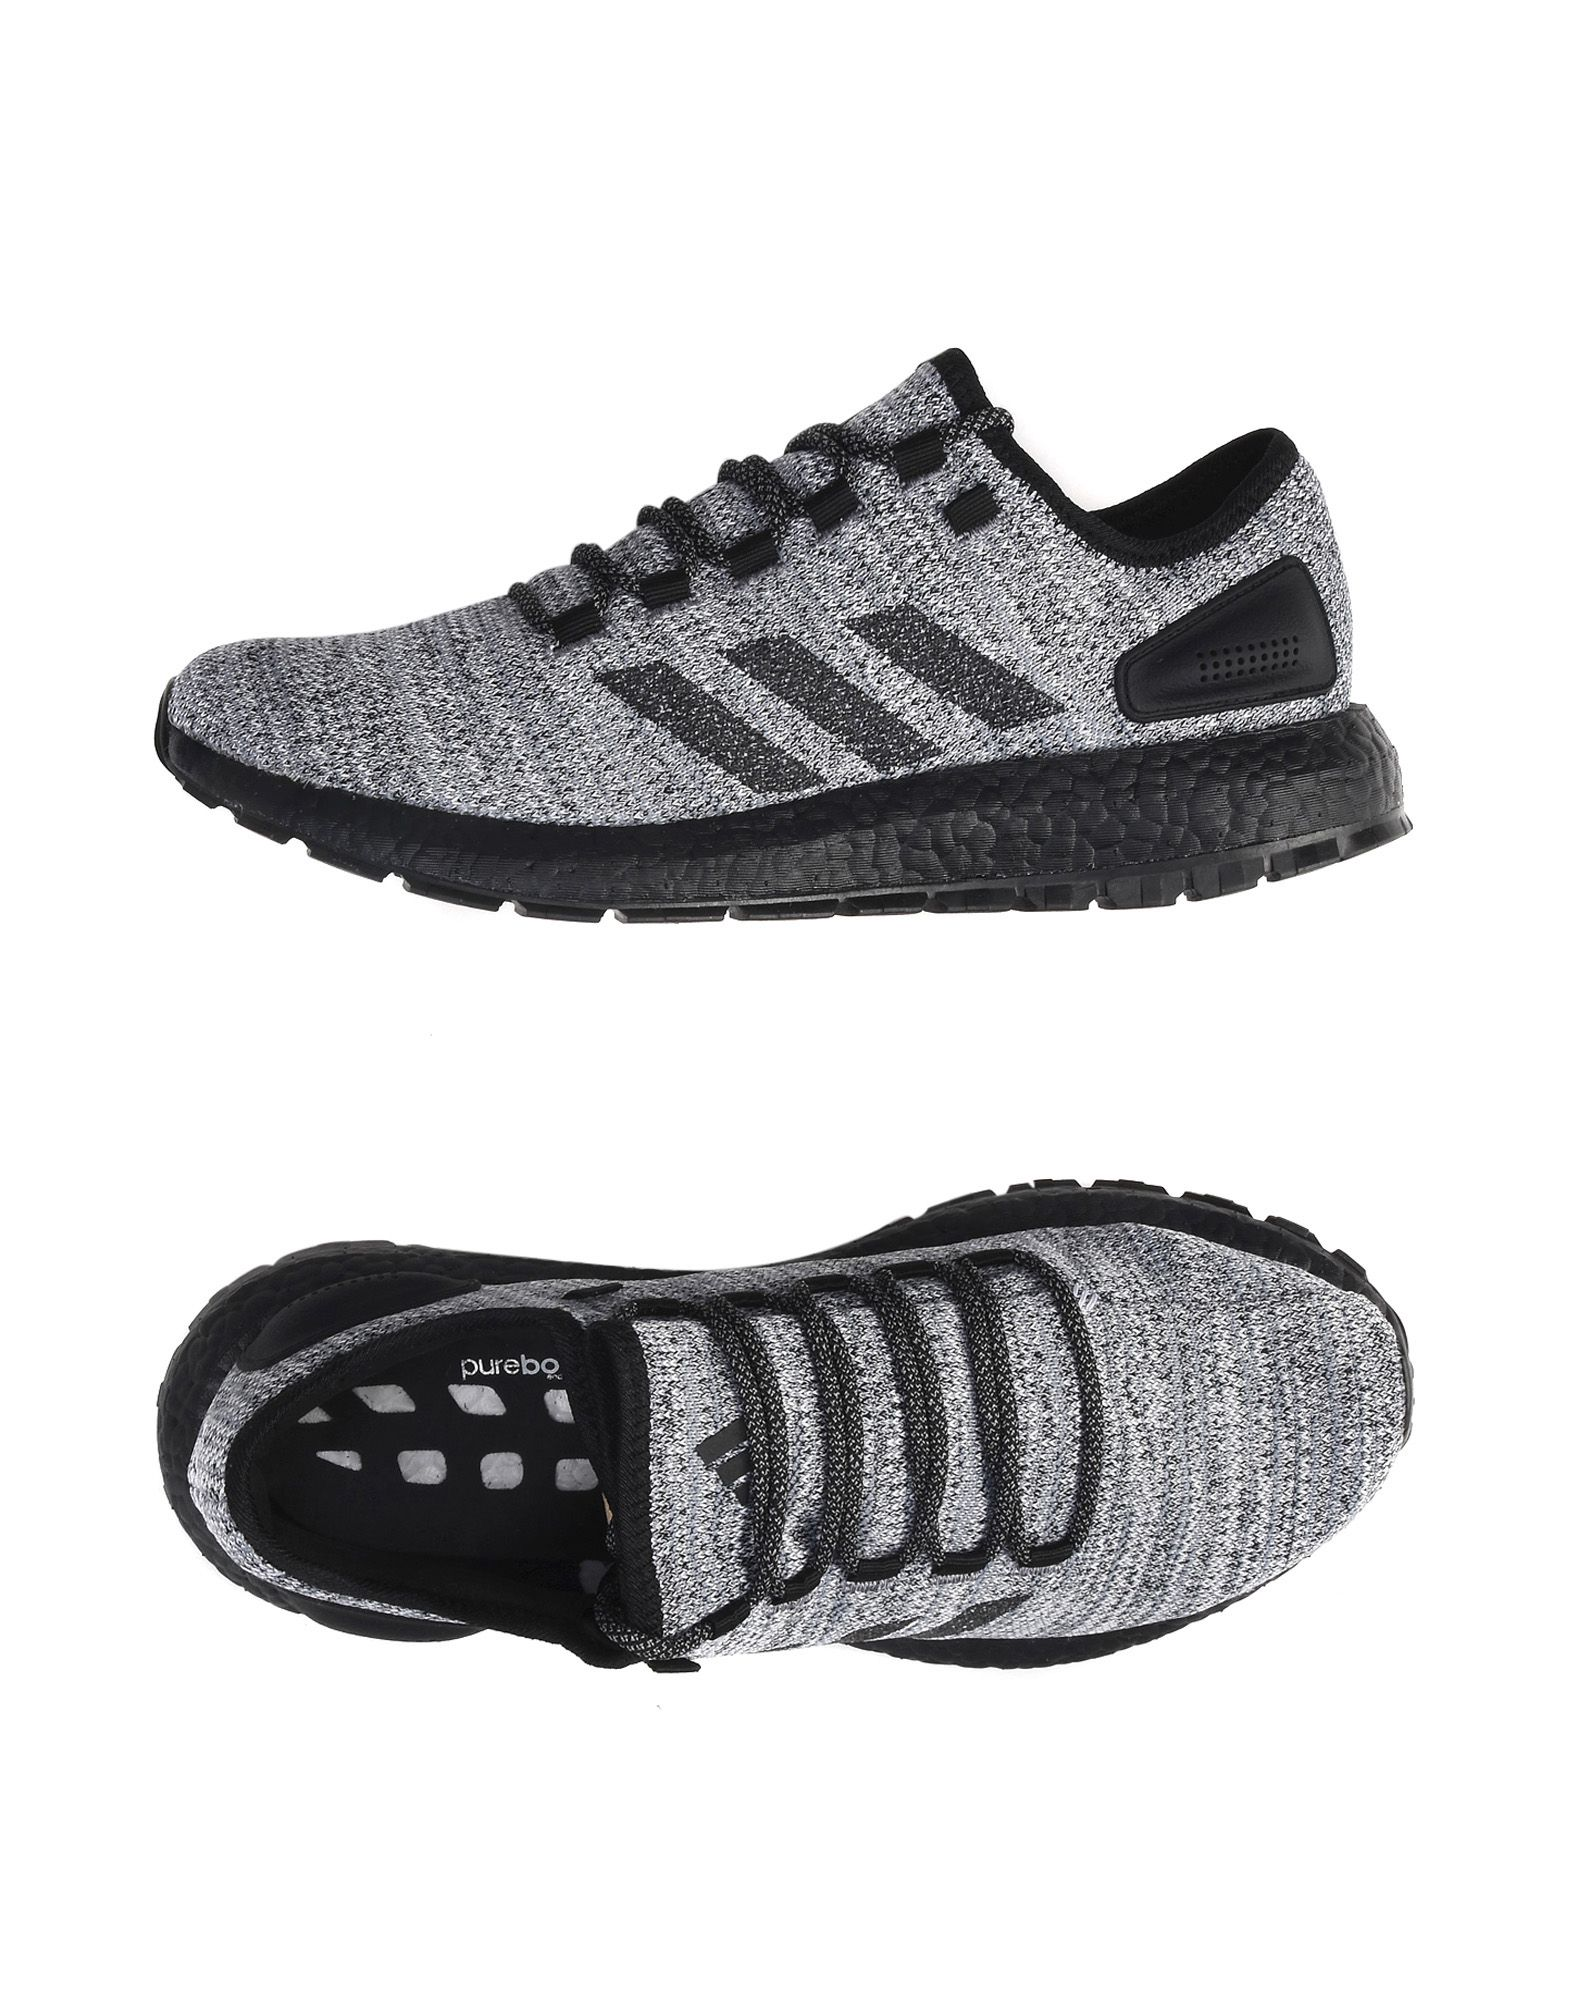 Adidas Pureboost Atr - Sneakers online - Men Adidas Sneakers online Sneakers on  United Kingdom - 11385982DD 356560